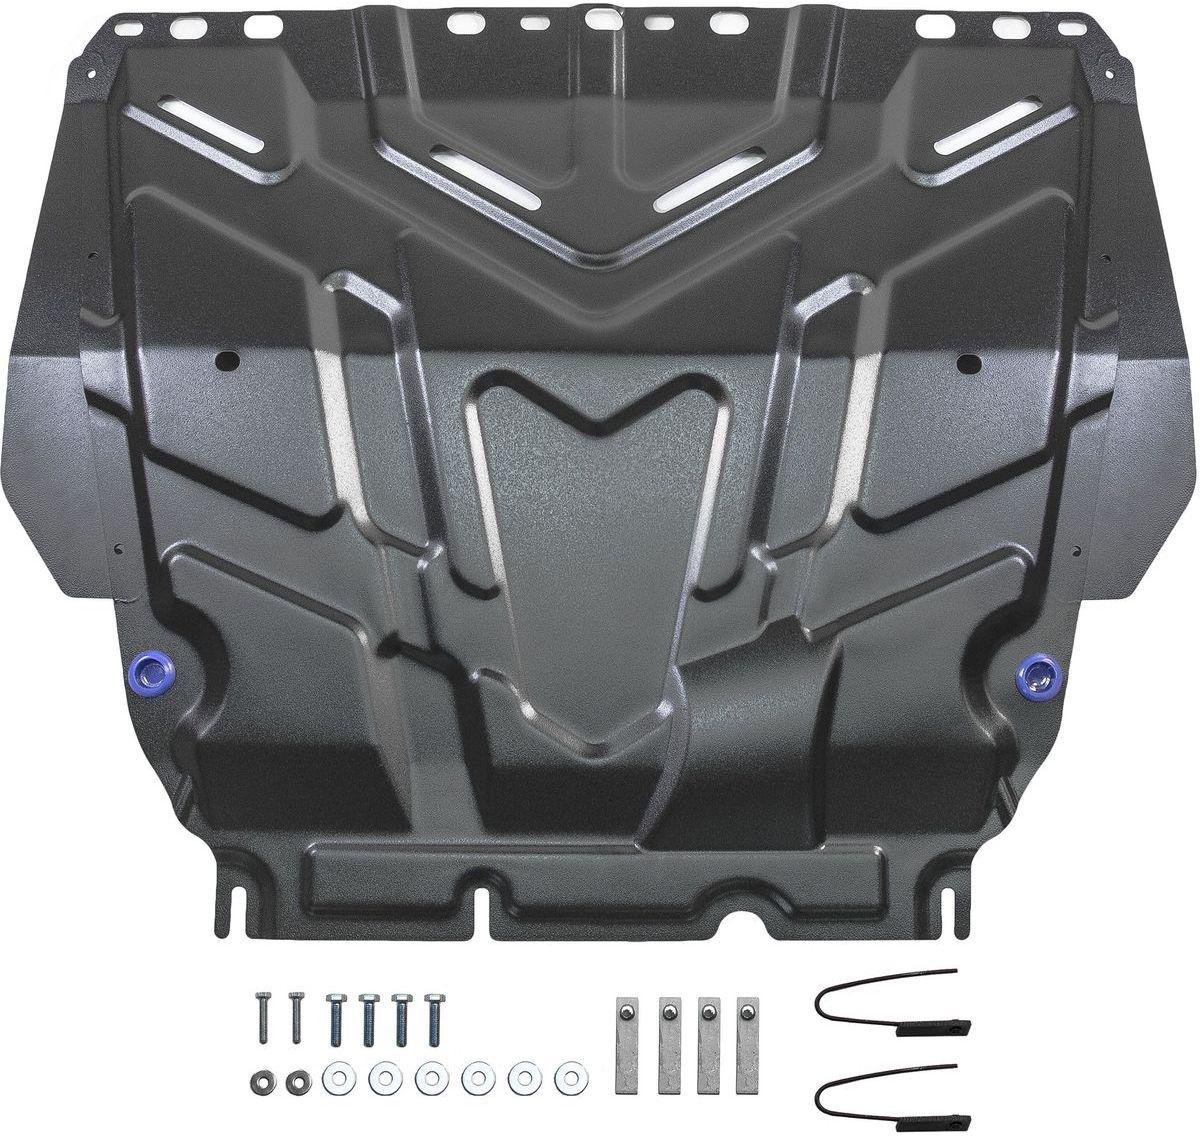 "Защита картера и КПП ""Rival"" для Ford С-Max 2003-2010/Ford Focus 2005-2011 2011-2015 2015-н.в./Ford Grand C-Max 2010-2015/Ford Kuga 2008-2013, сталь 2 мм"